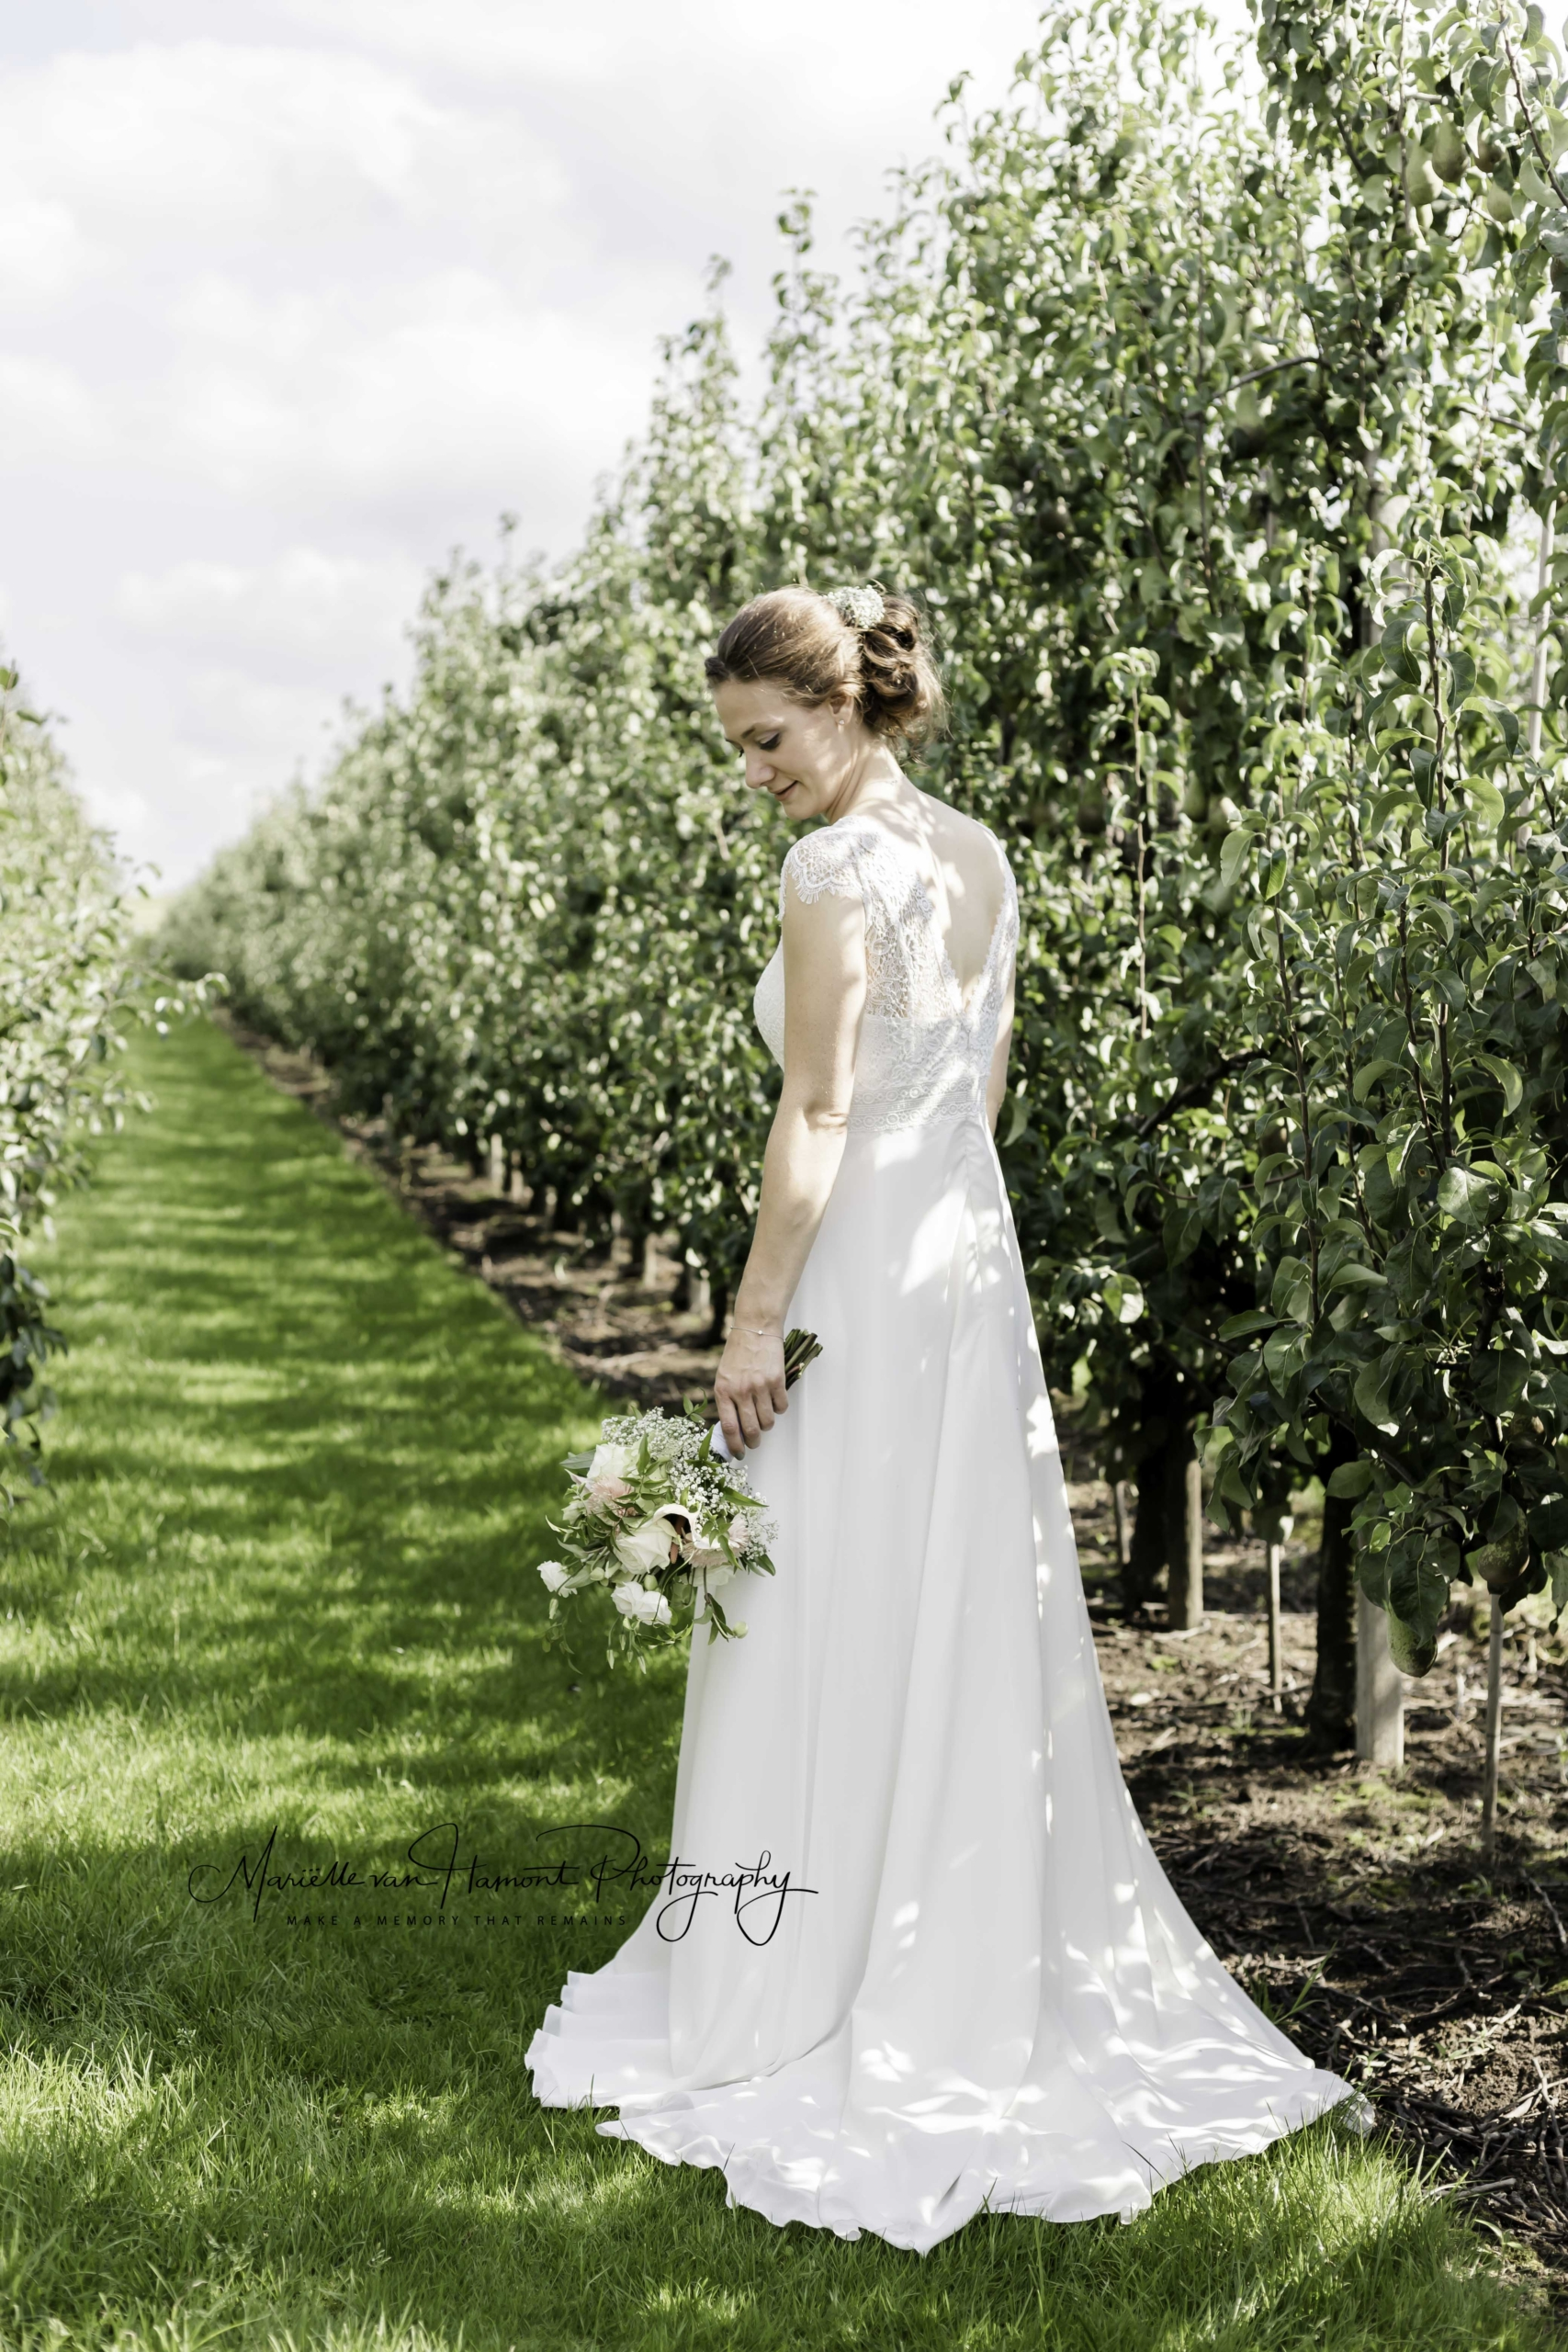 hamontfotografie | bruidsfotografie | ja ik wil | bruidsfotograaf Noord-Brabant | bruidsfotograaf Nederland | trouwen | trouwfotograaf